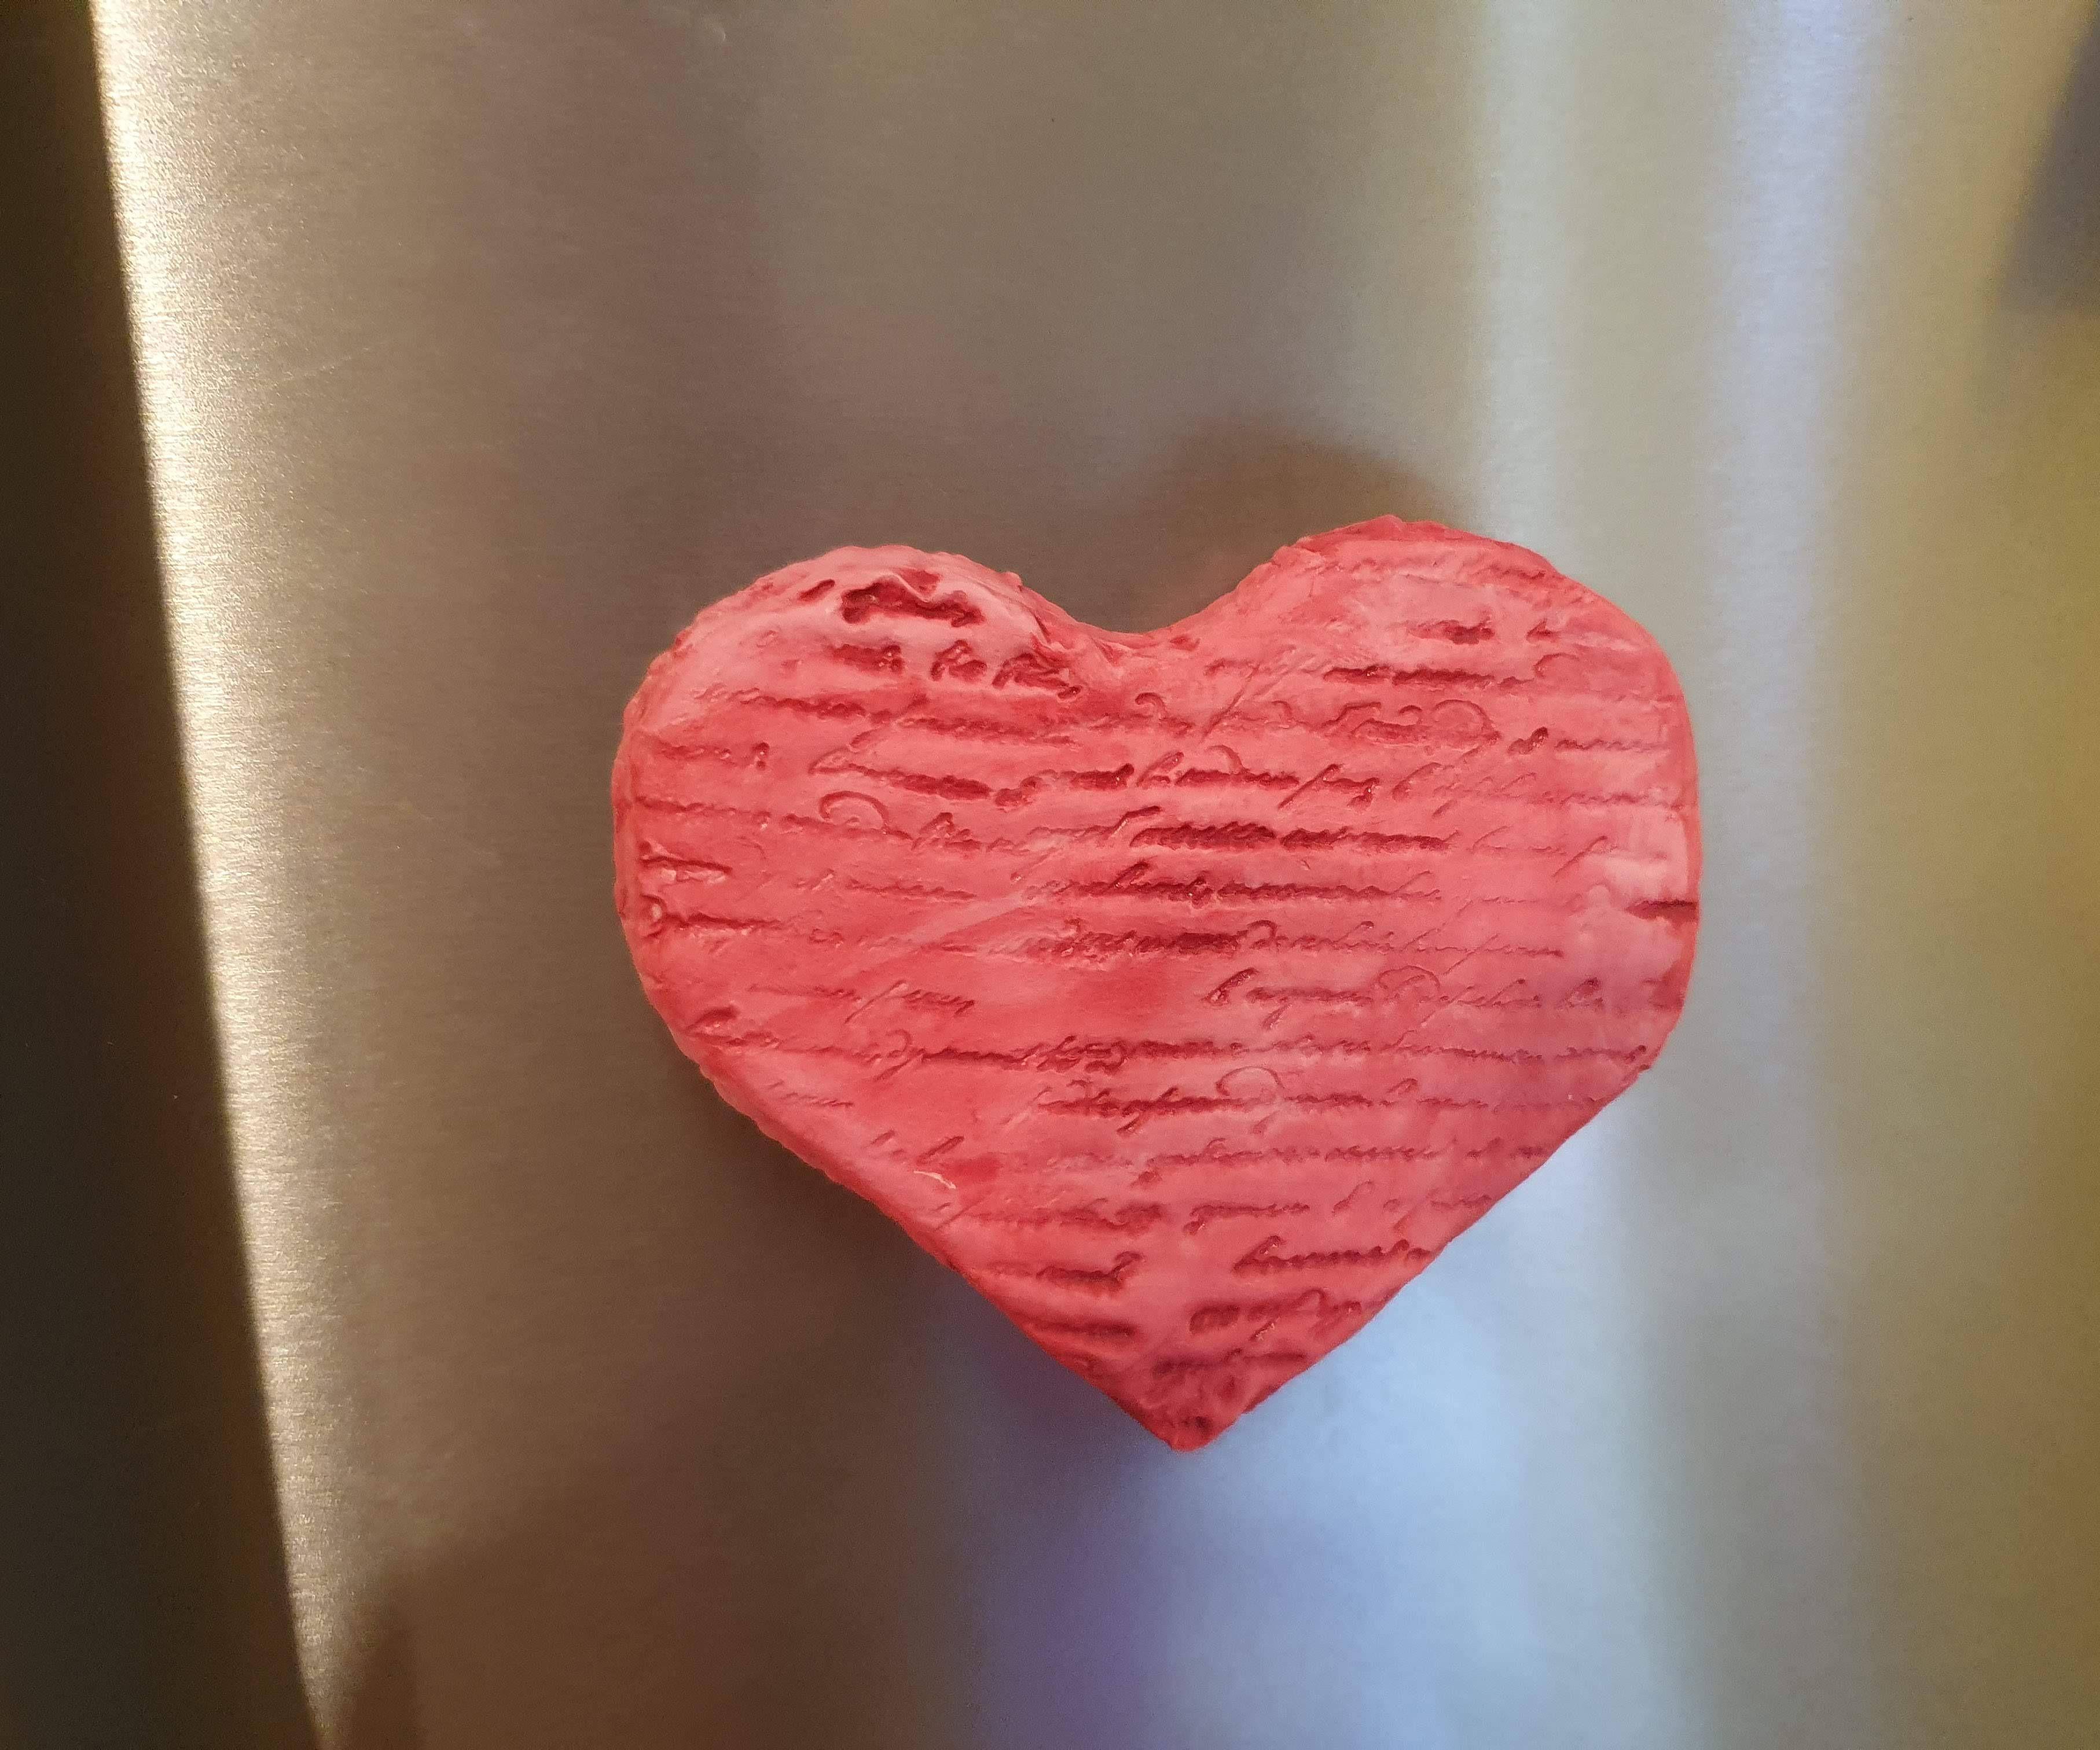 Heart Shaped Refigerator Magnet